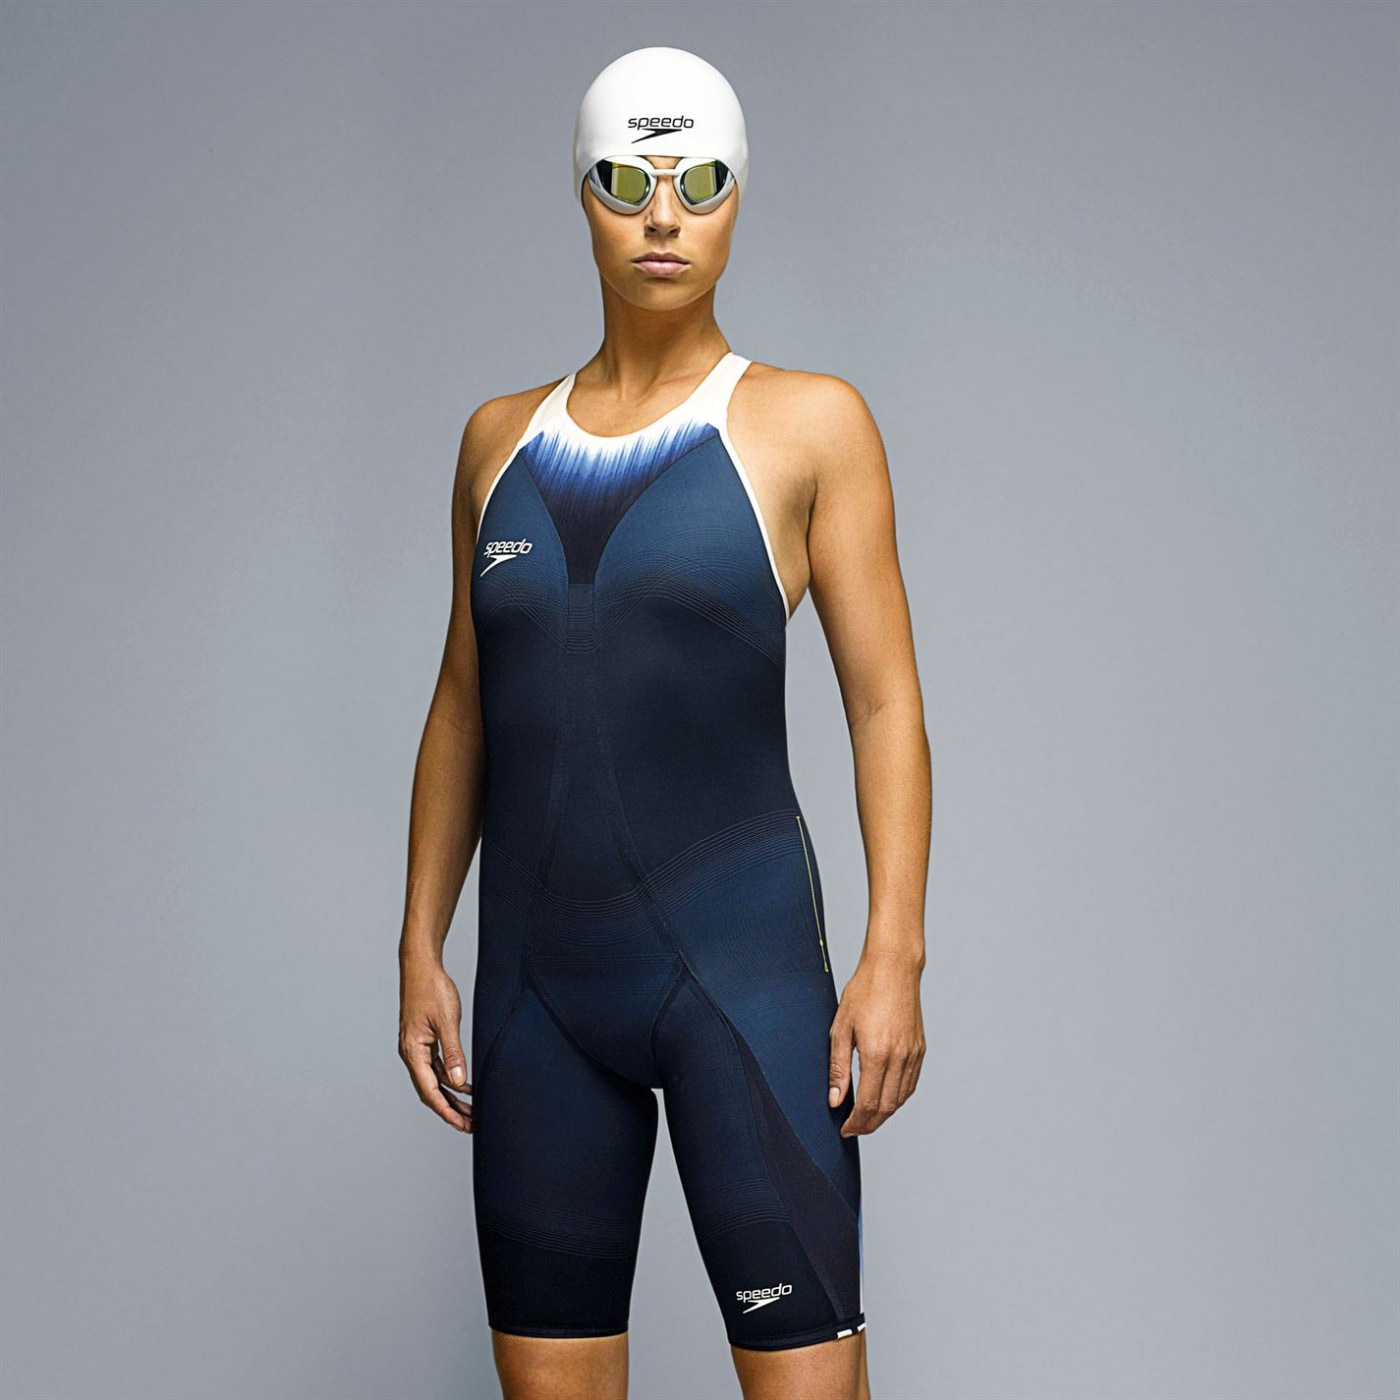 Speedo Super Elite Recordbreaker Swimsuit Ladies